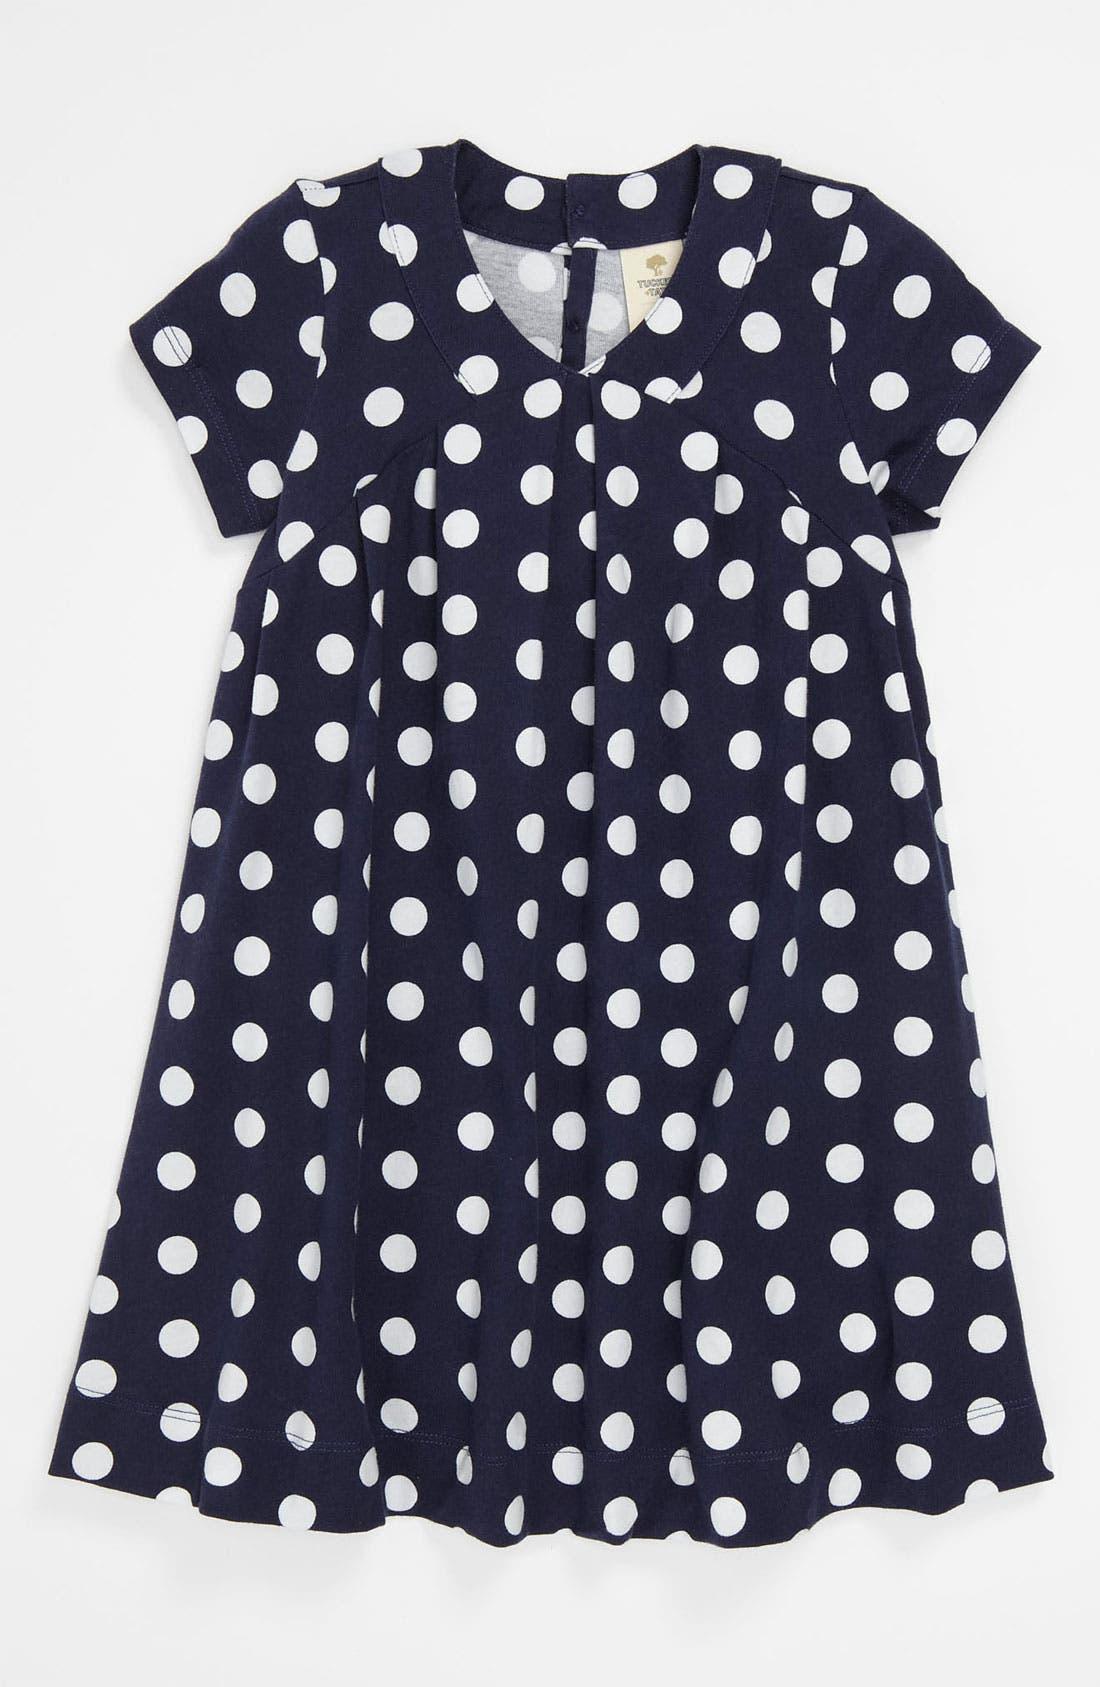 Main Image - Tucker + Tate 'Spinnaker' Knit Dress (Toddler)